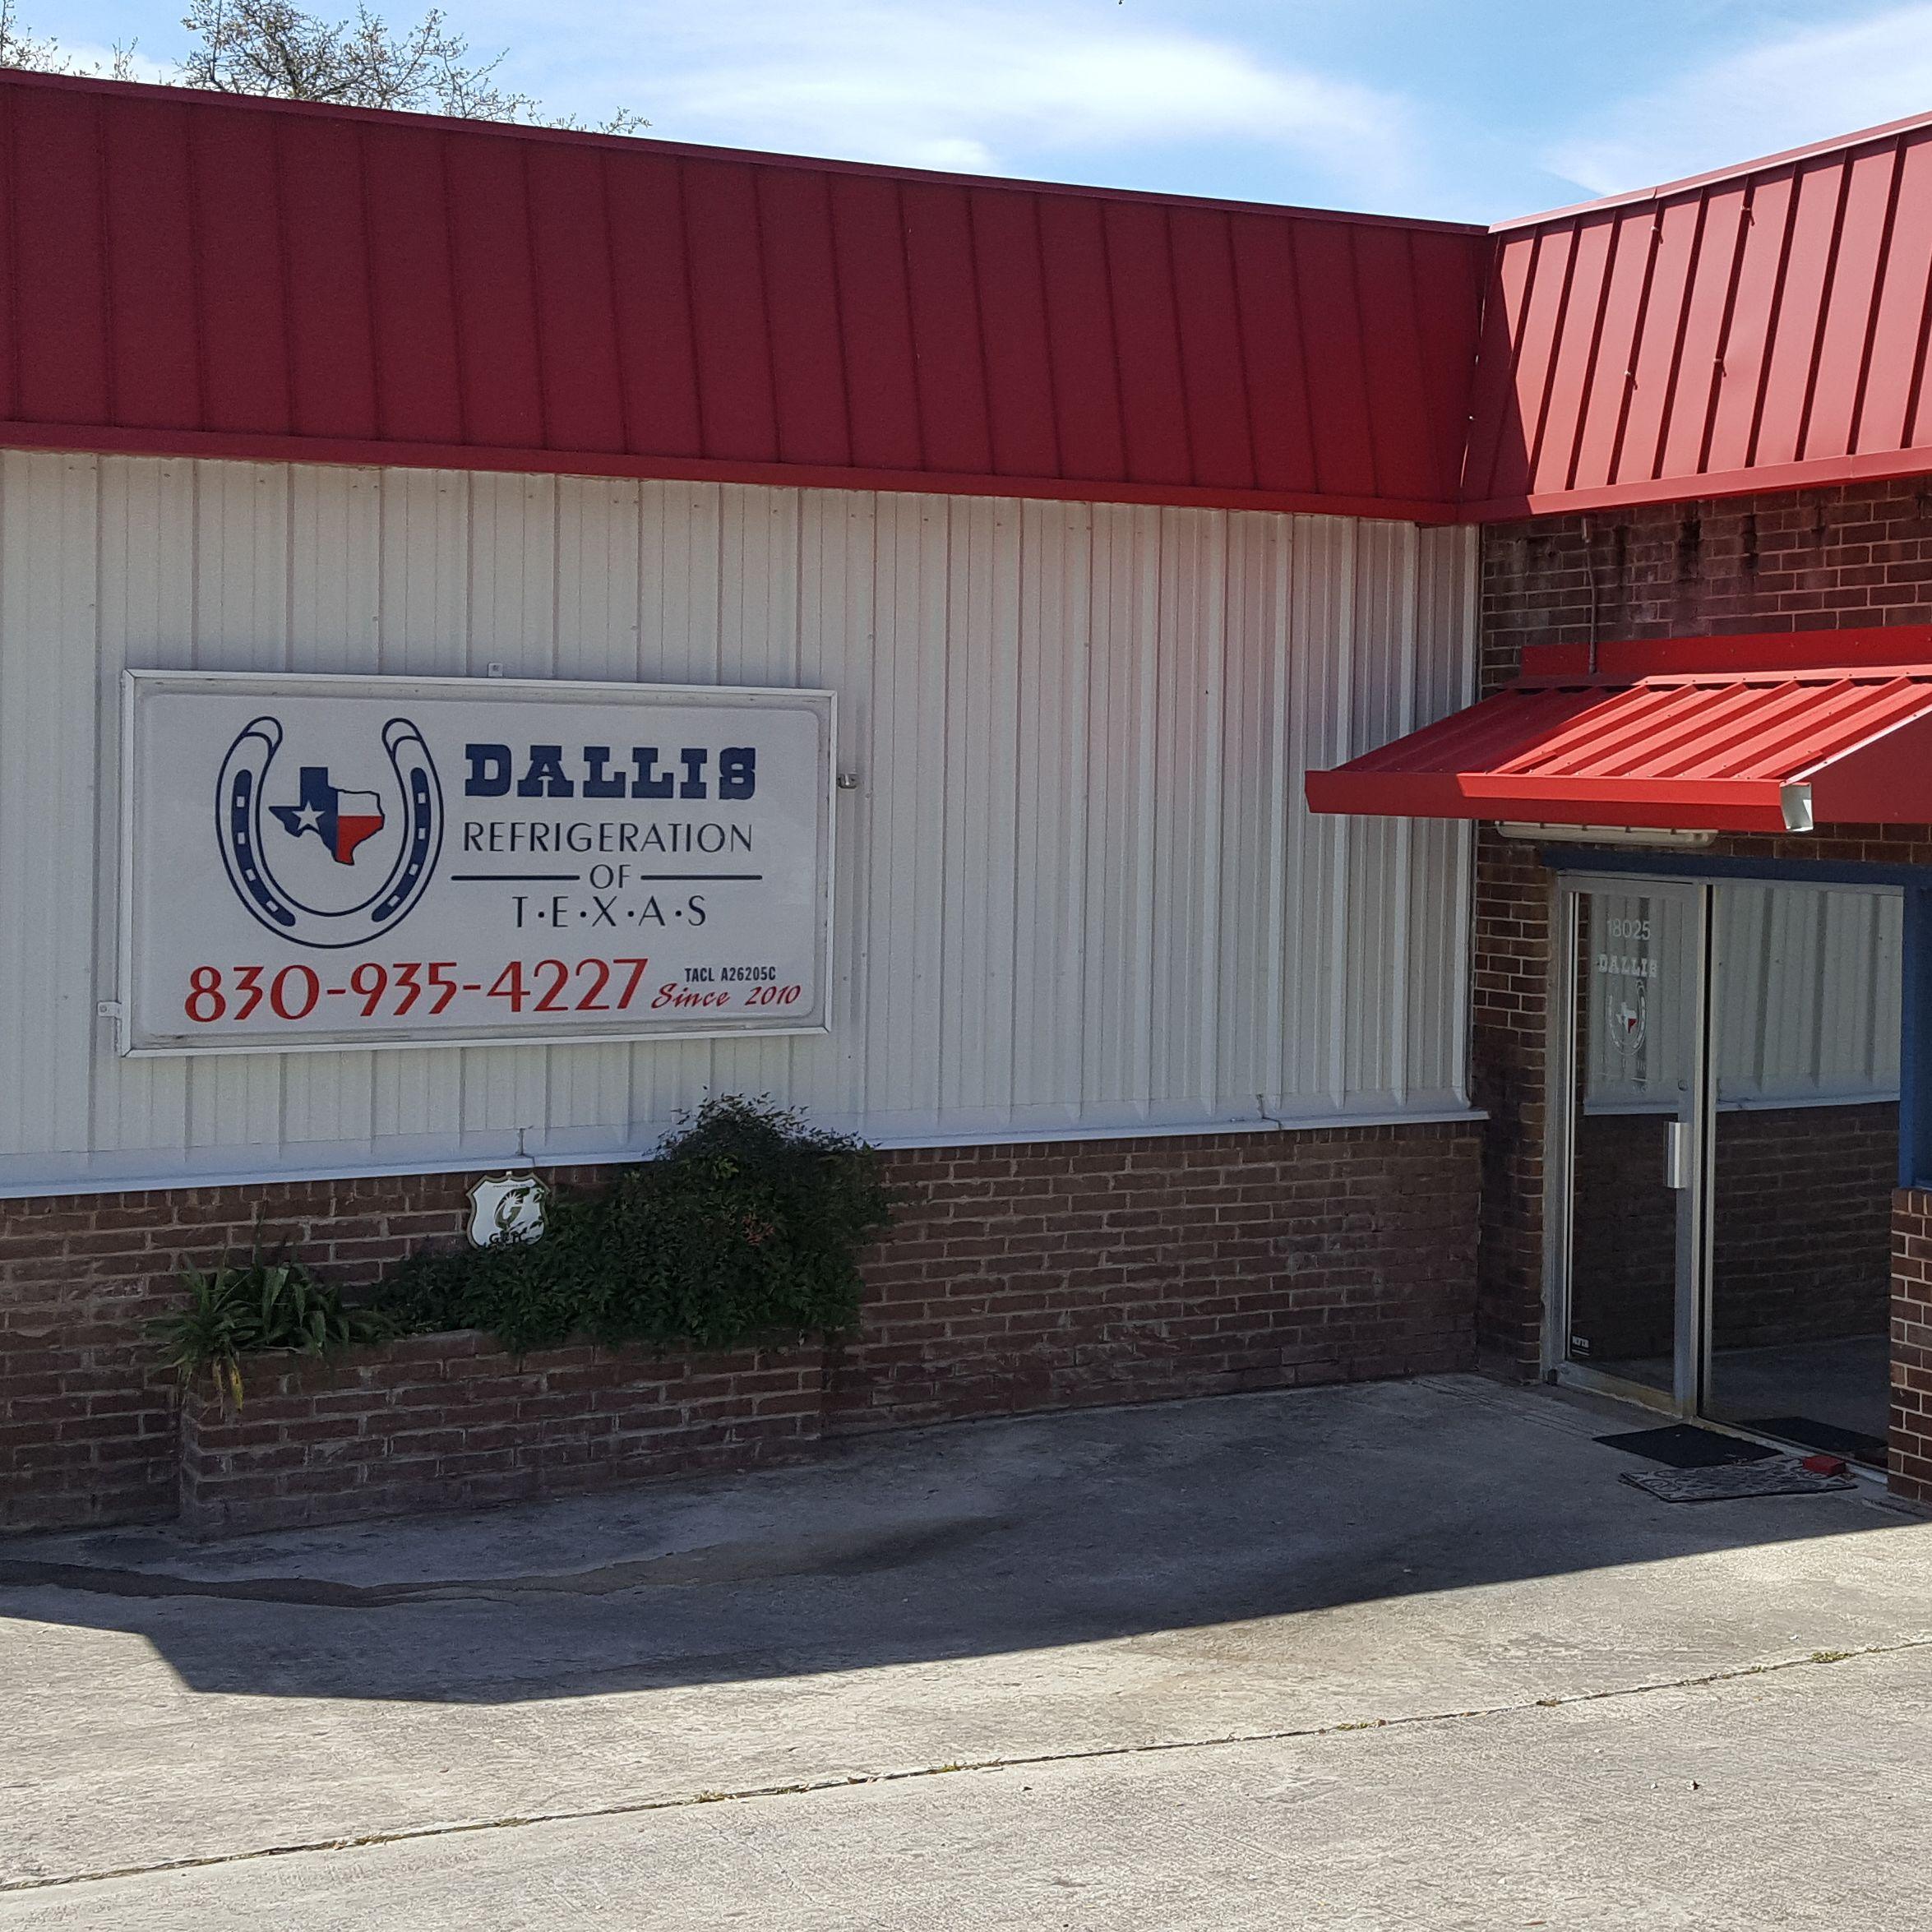 Dallis Refrigeration of Texas